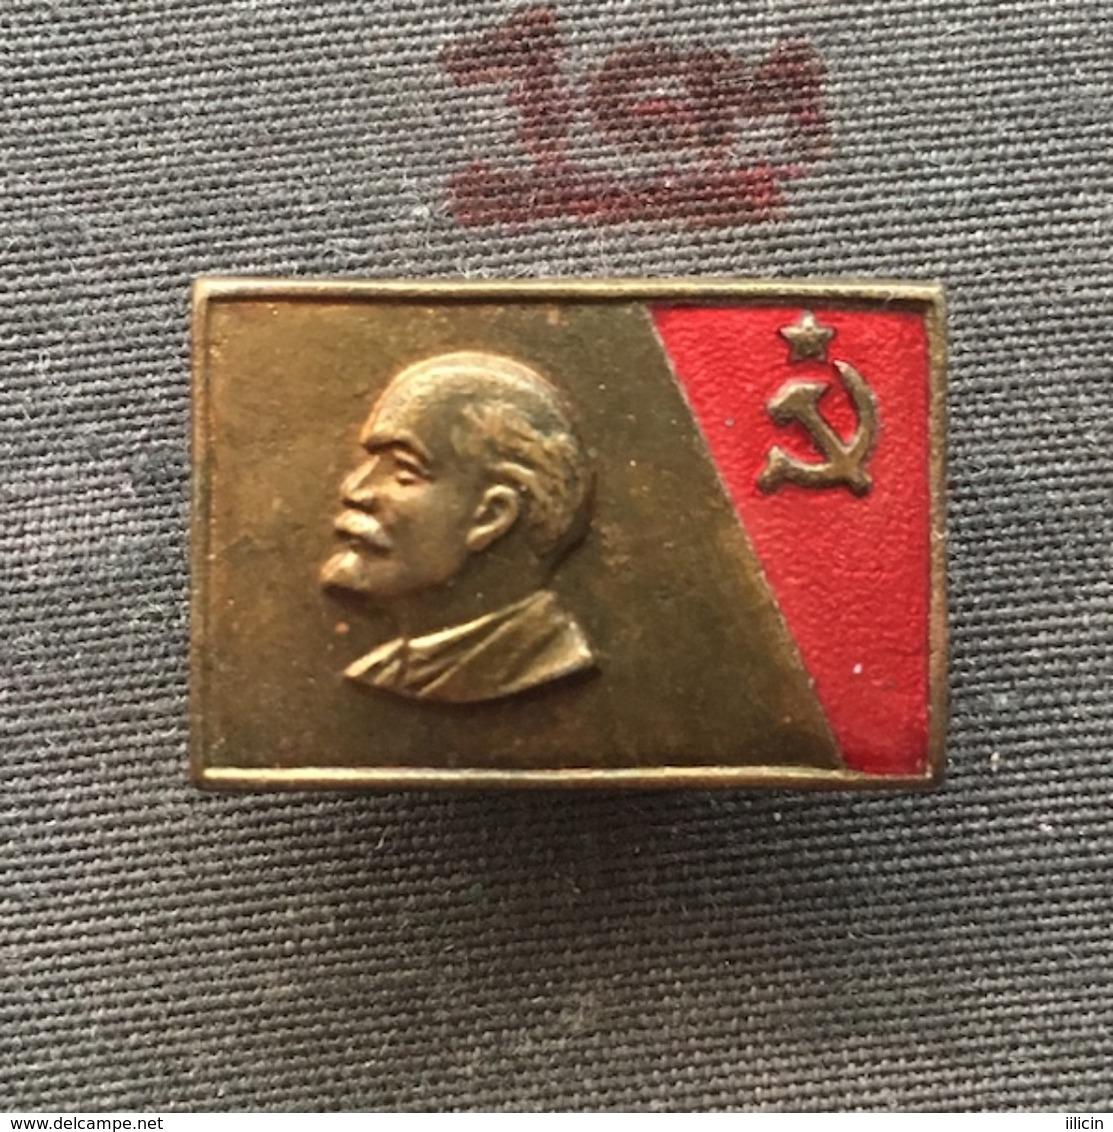 Badge (Pin) ZN006761 - Vladimir Ilyich Ulyanov Lenin Communist Russia Soviet Union (SSSR / CCCP / USSR) - Berühmte Personen